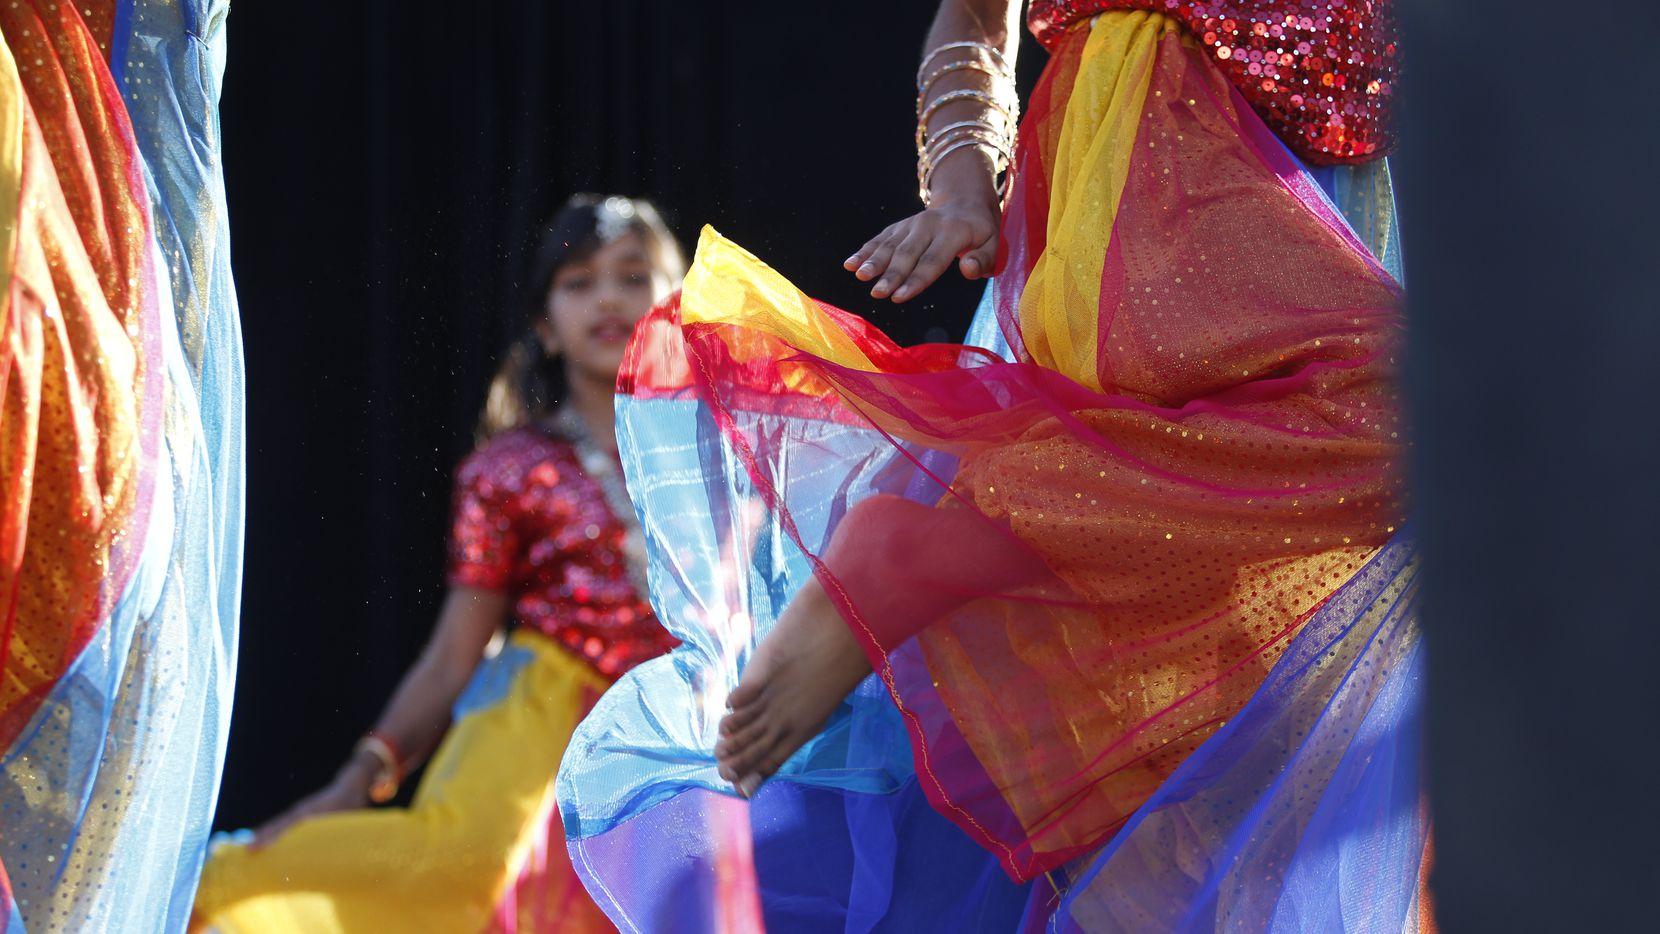 The students of Masti Dance perform at the 9th annual Diwali Mela on Nov. 1, 2014 in Dallas.  (Kirsten Kearse/The Dallas Morning News)